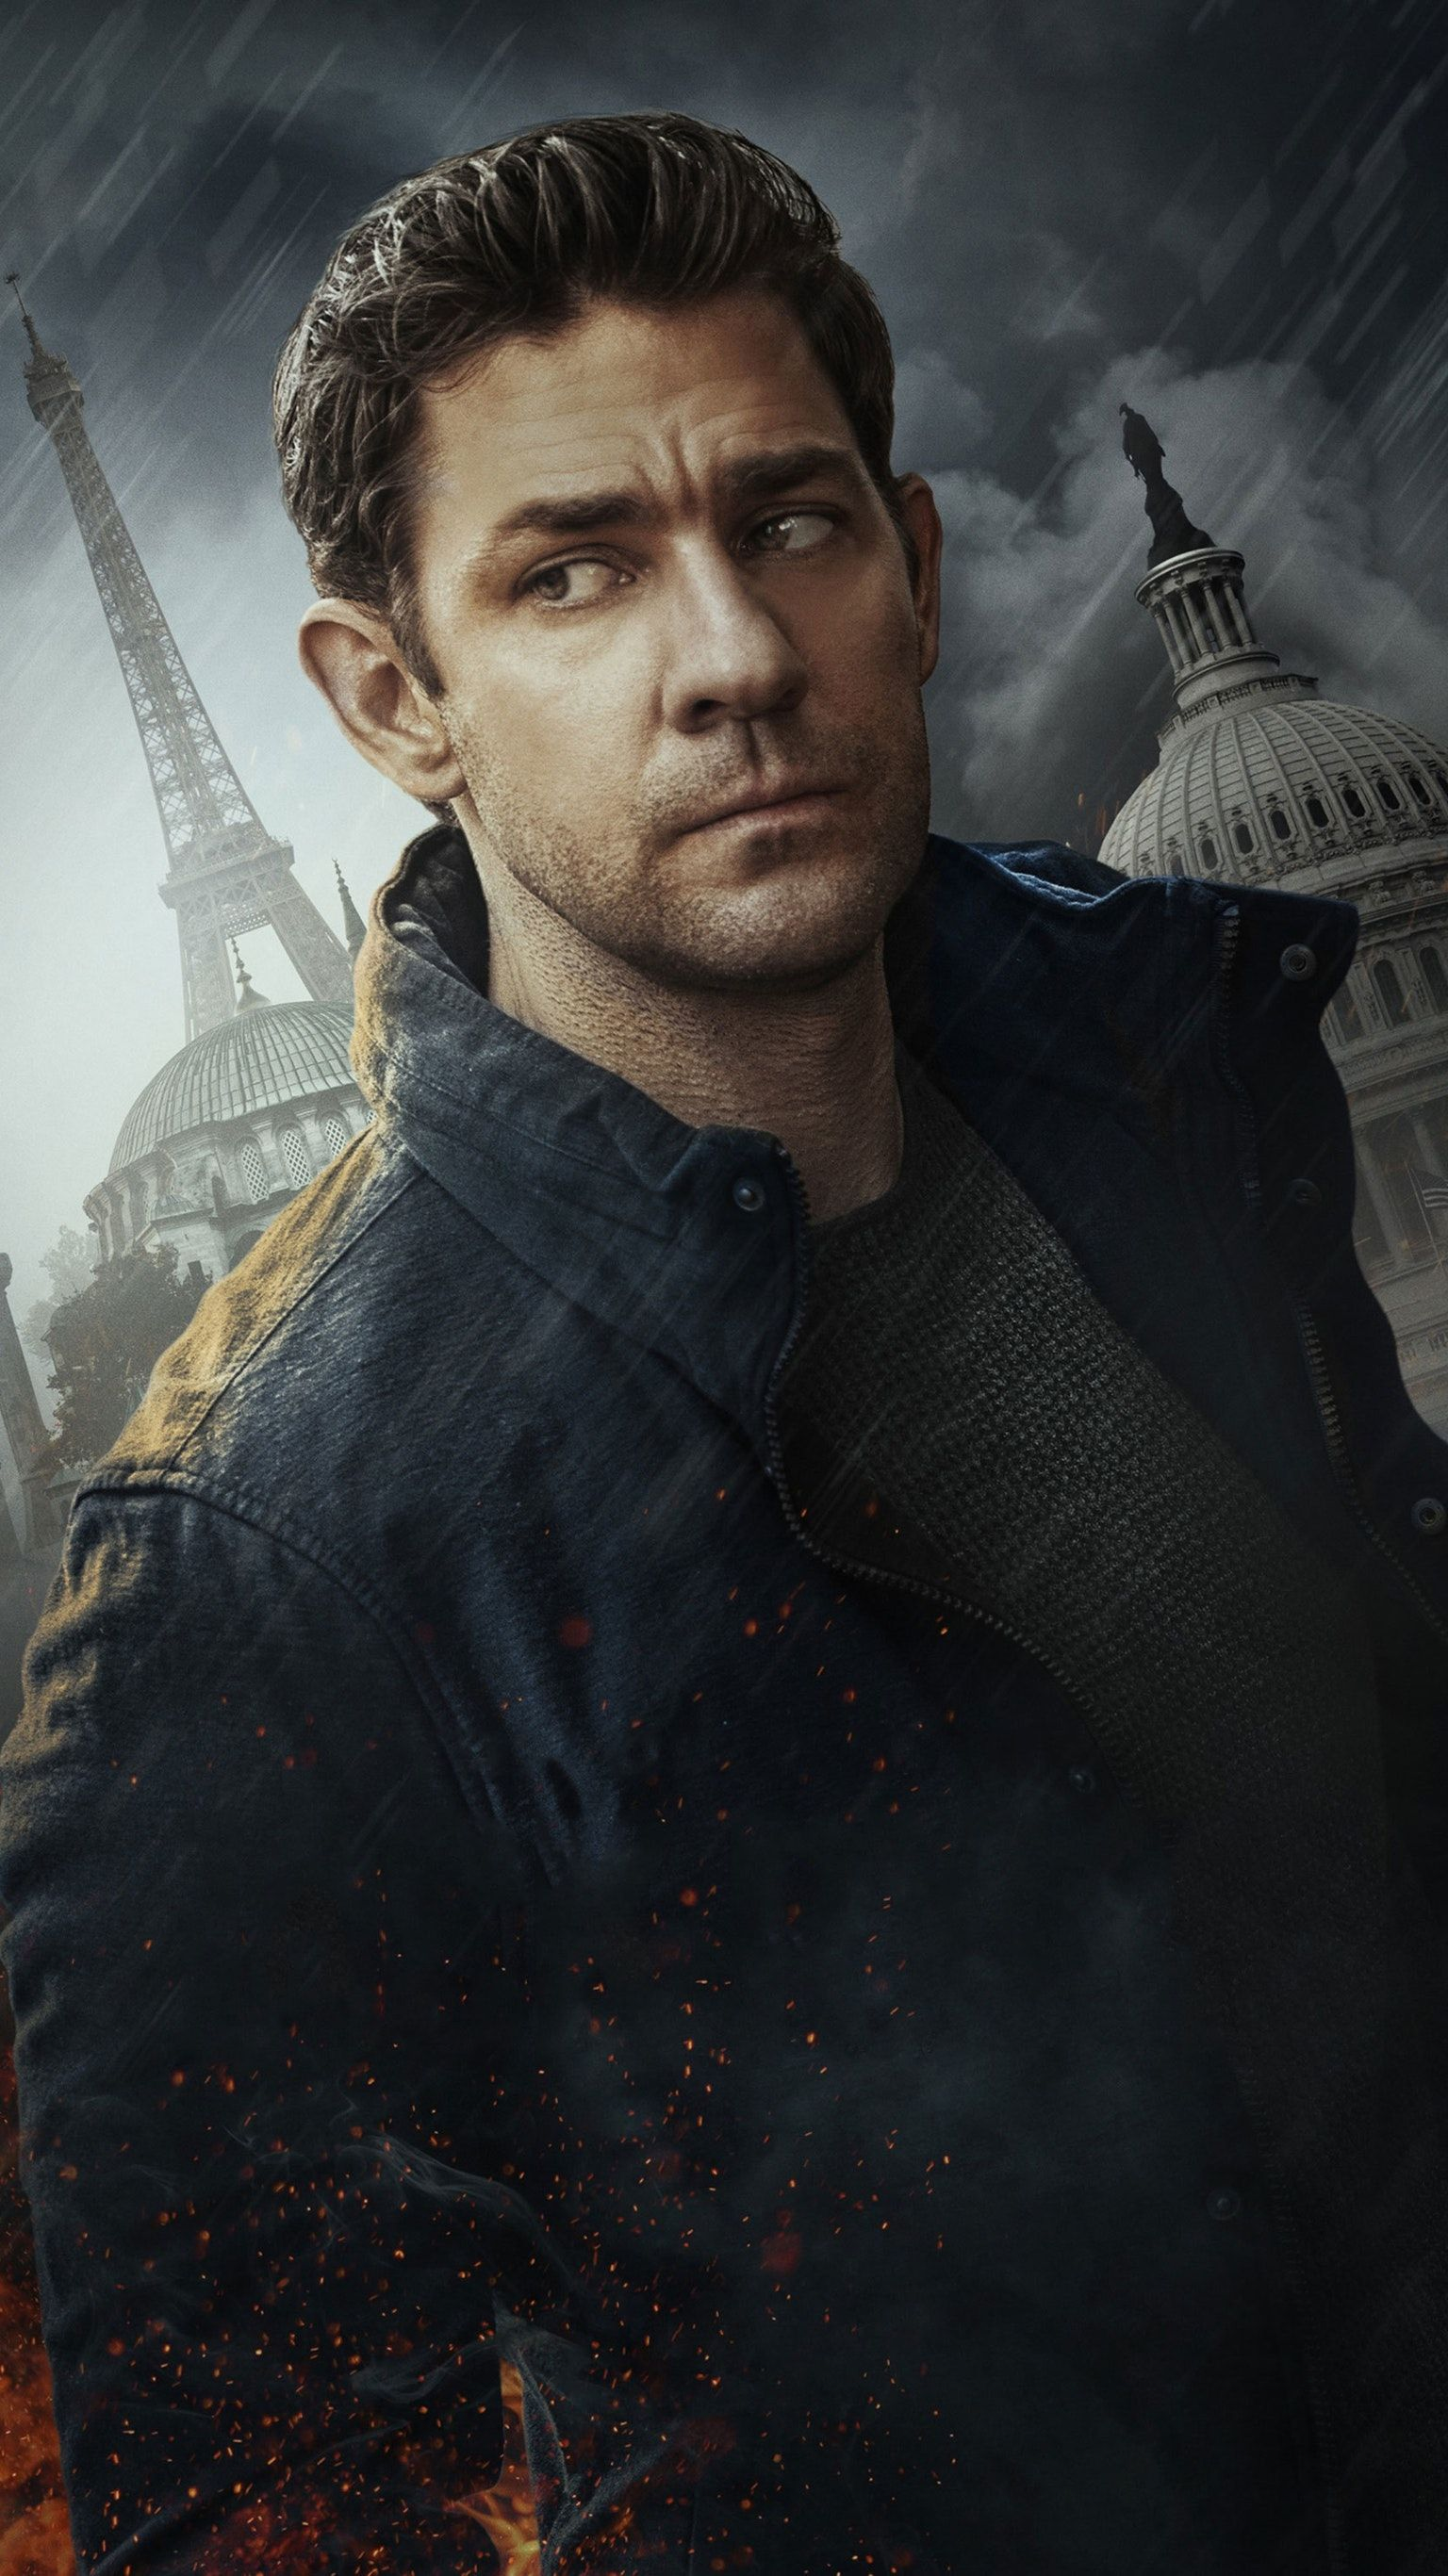 Tom Clancy S Jack Ryan Phone Wallpaper Moviemania John krasinski tom clancys jack ryan